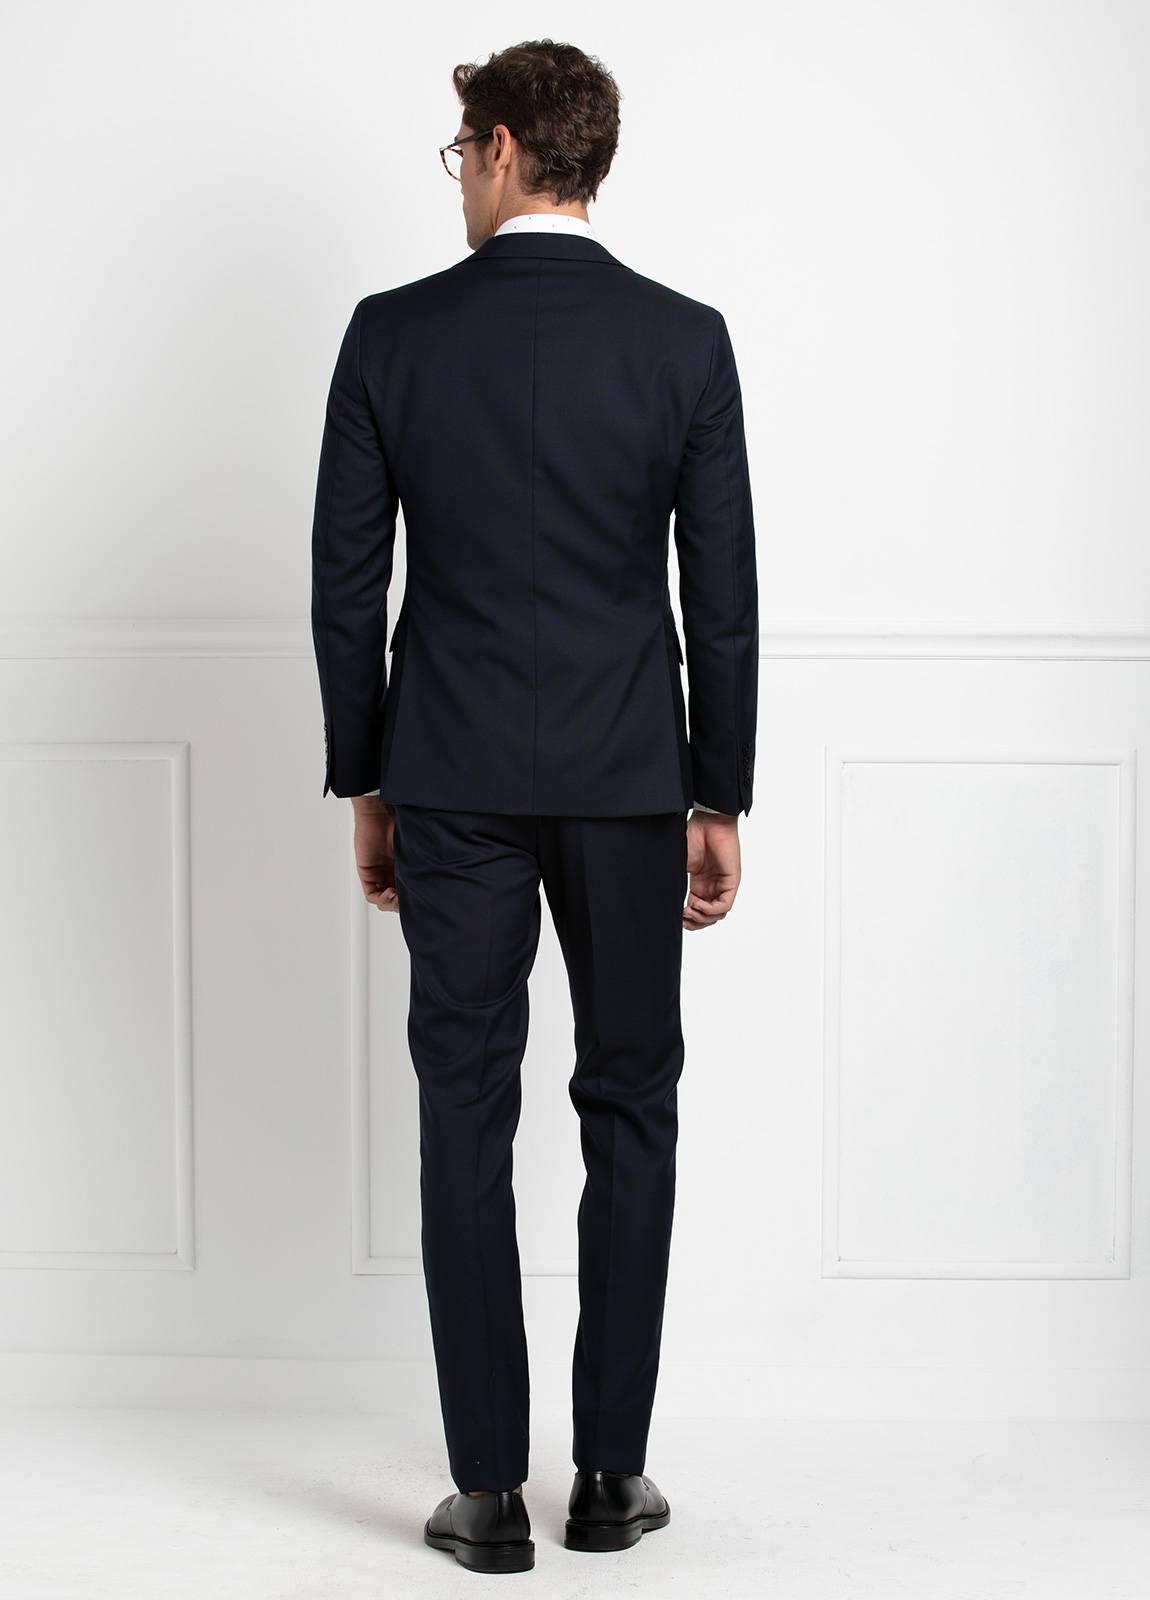 Traje liso SLIM FIT, tejido VBC con chaleco incluido, color azul marino, 100% Lana. - Ítem6